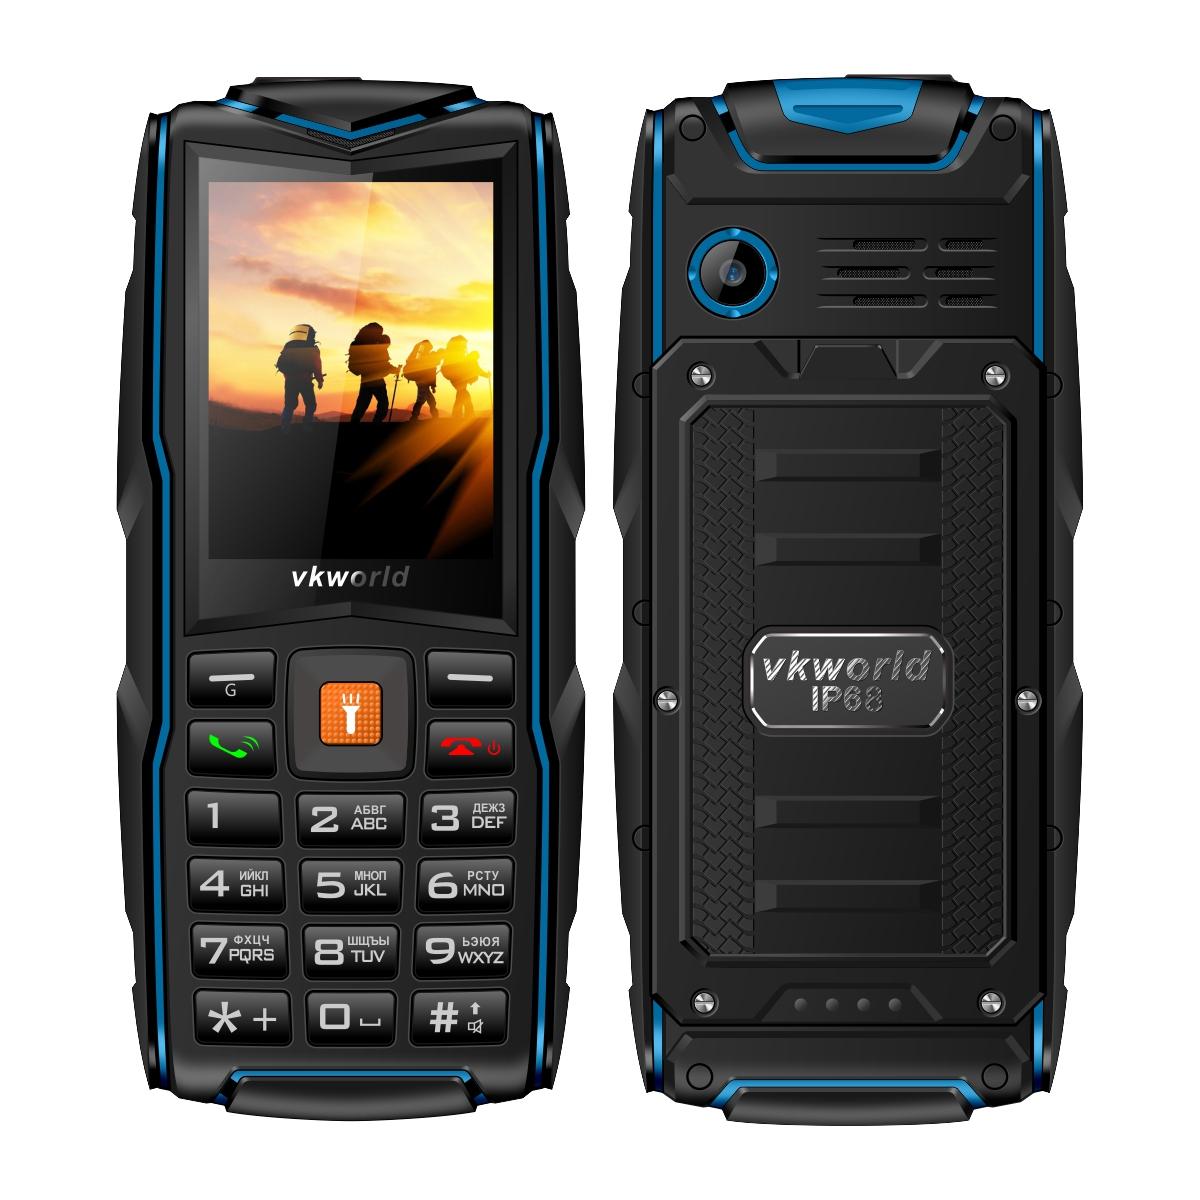 vkworld Синий цвет Евровилка tw520b bluetooth v3 0 partner gsm watch phone w 1 54 resistive screen quad band white